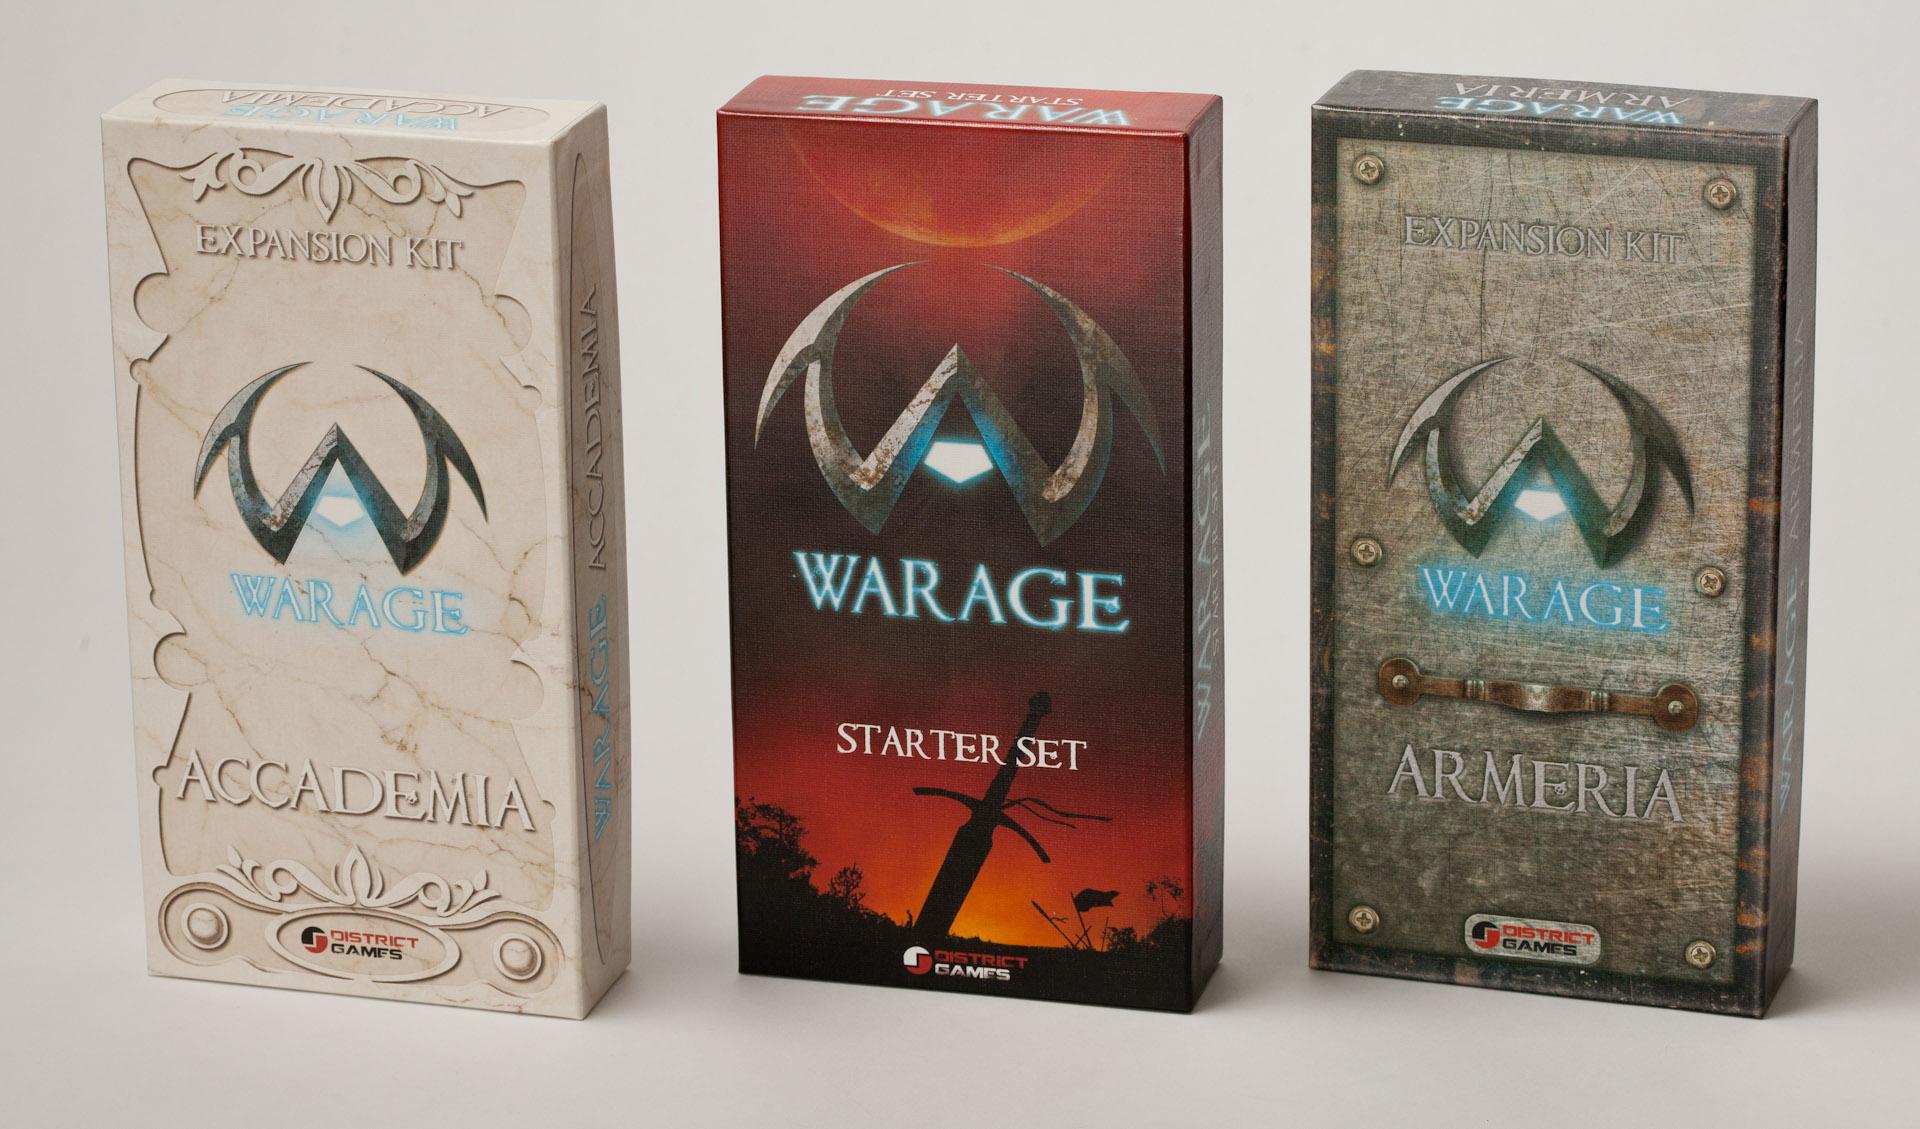 Warage Card Game, Packaging © District Games